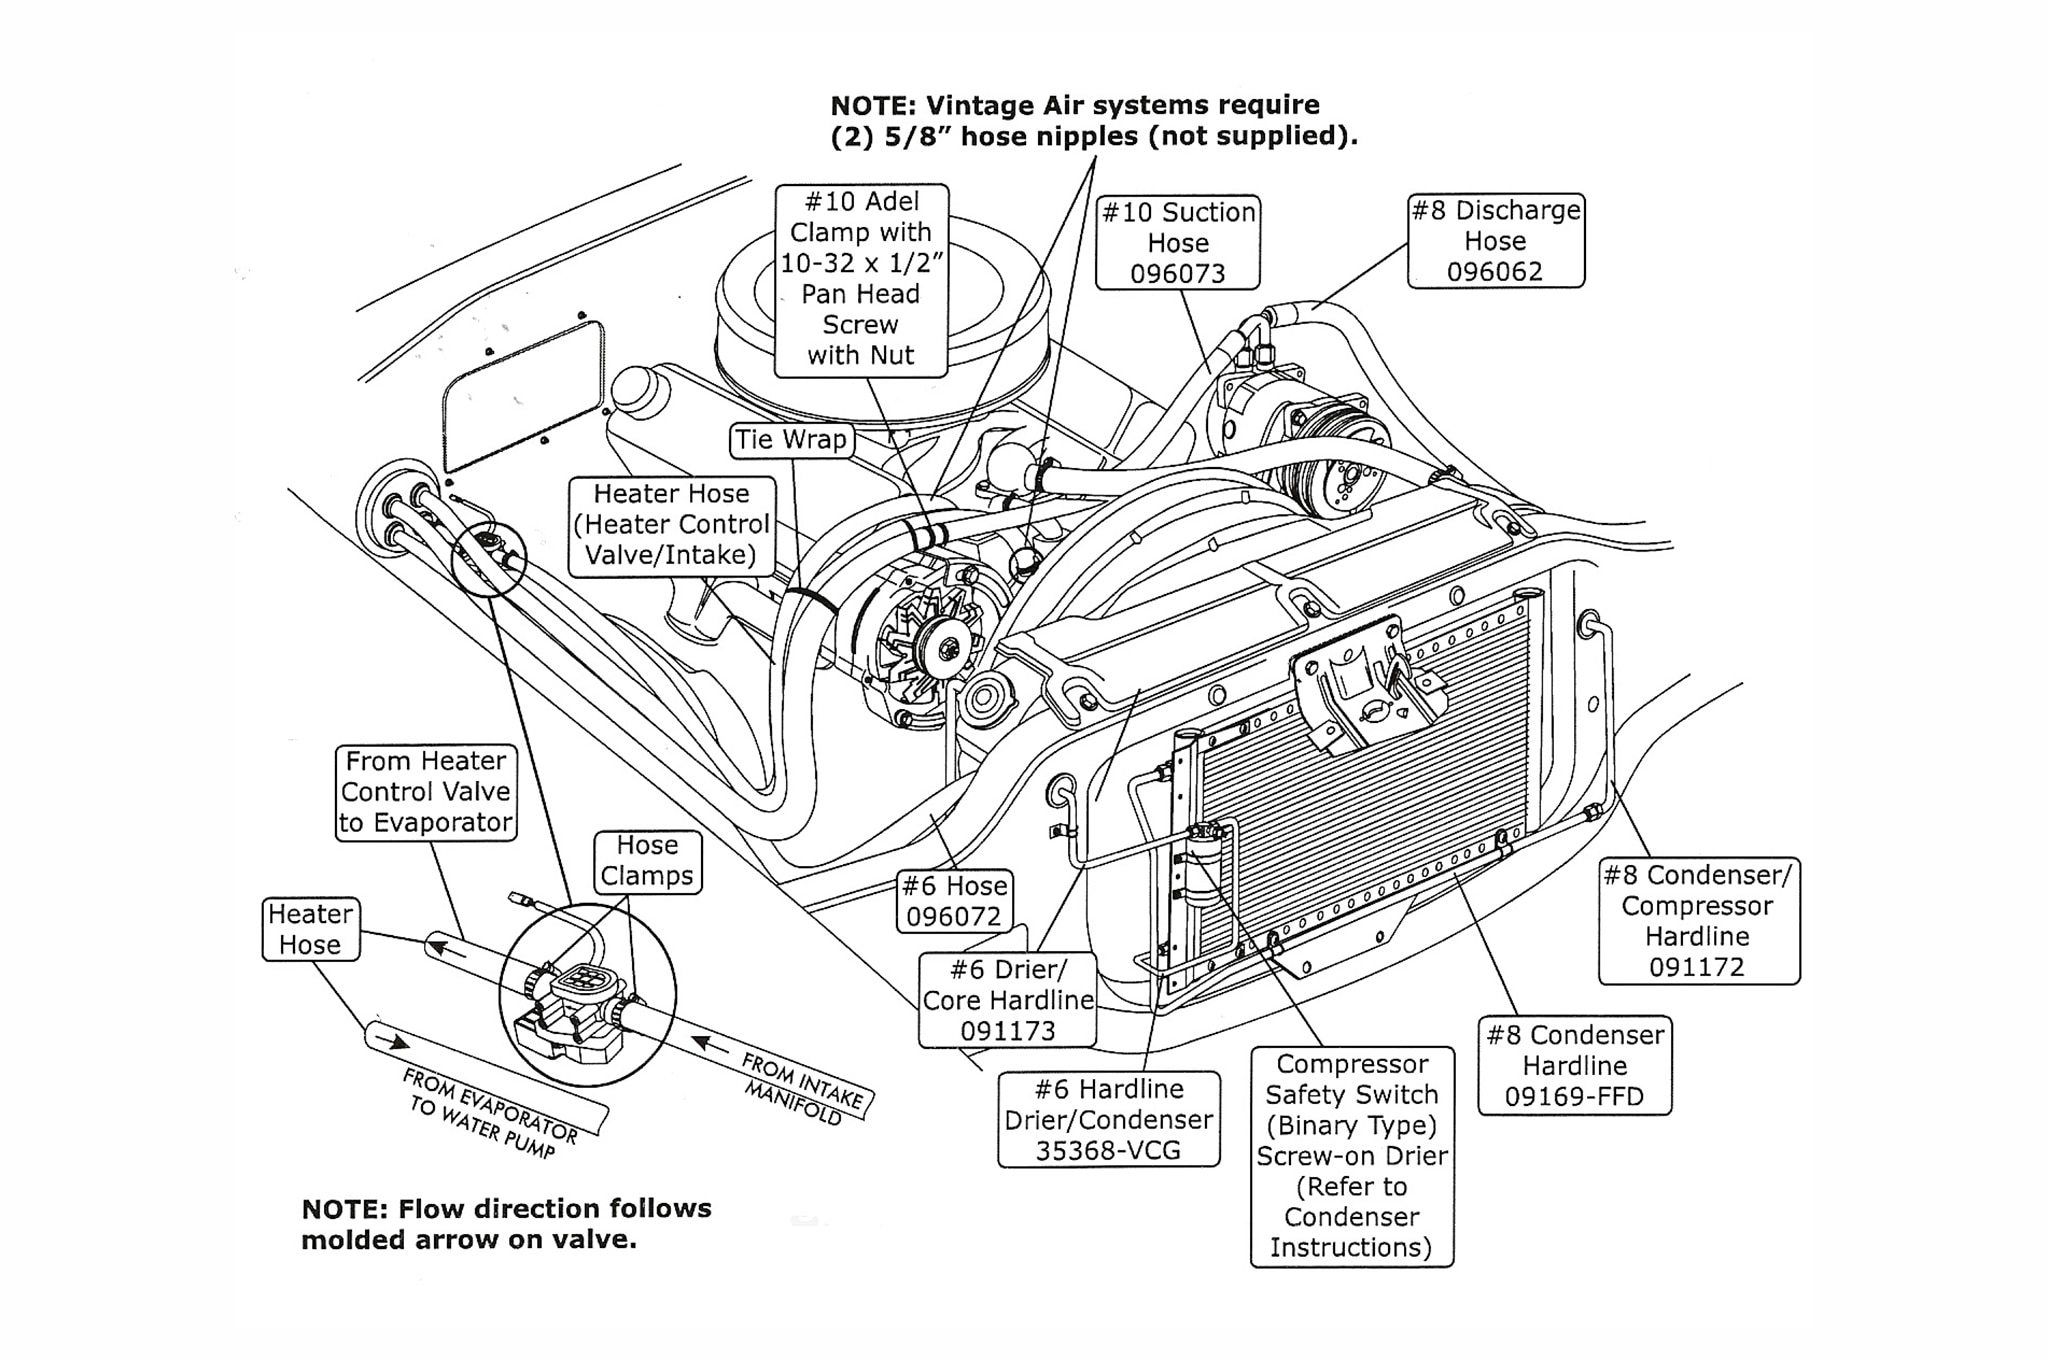 medium resolution of 1970 chevelle ac wiring diagram easy wiring diagrams u2022 chevelle engine wiring diagrams 70 chevelle